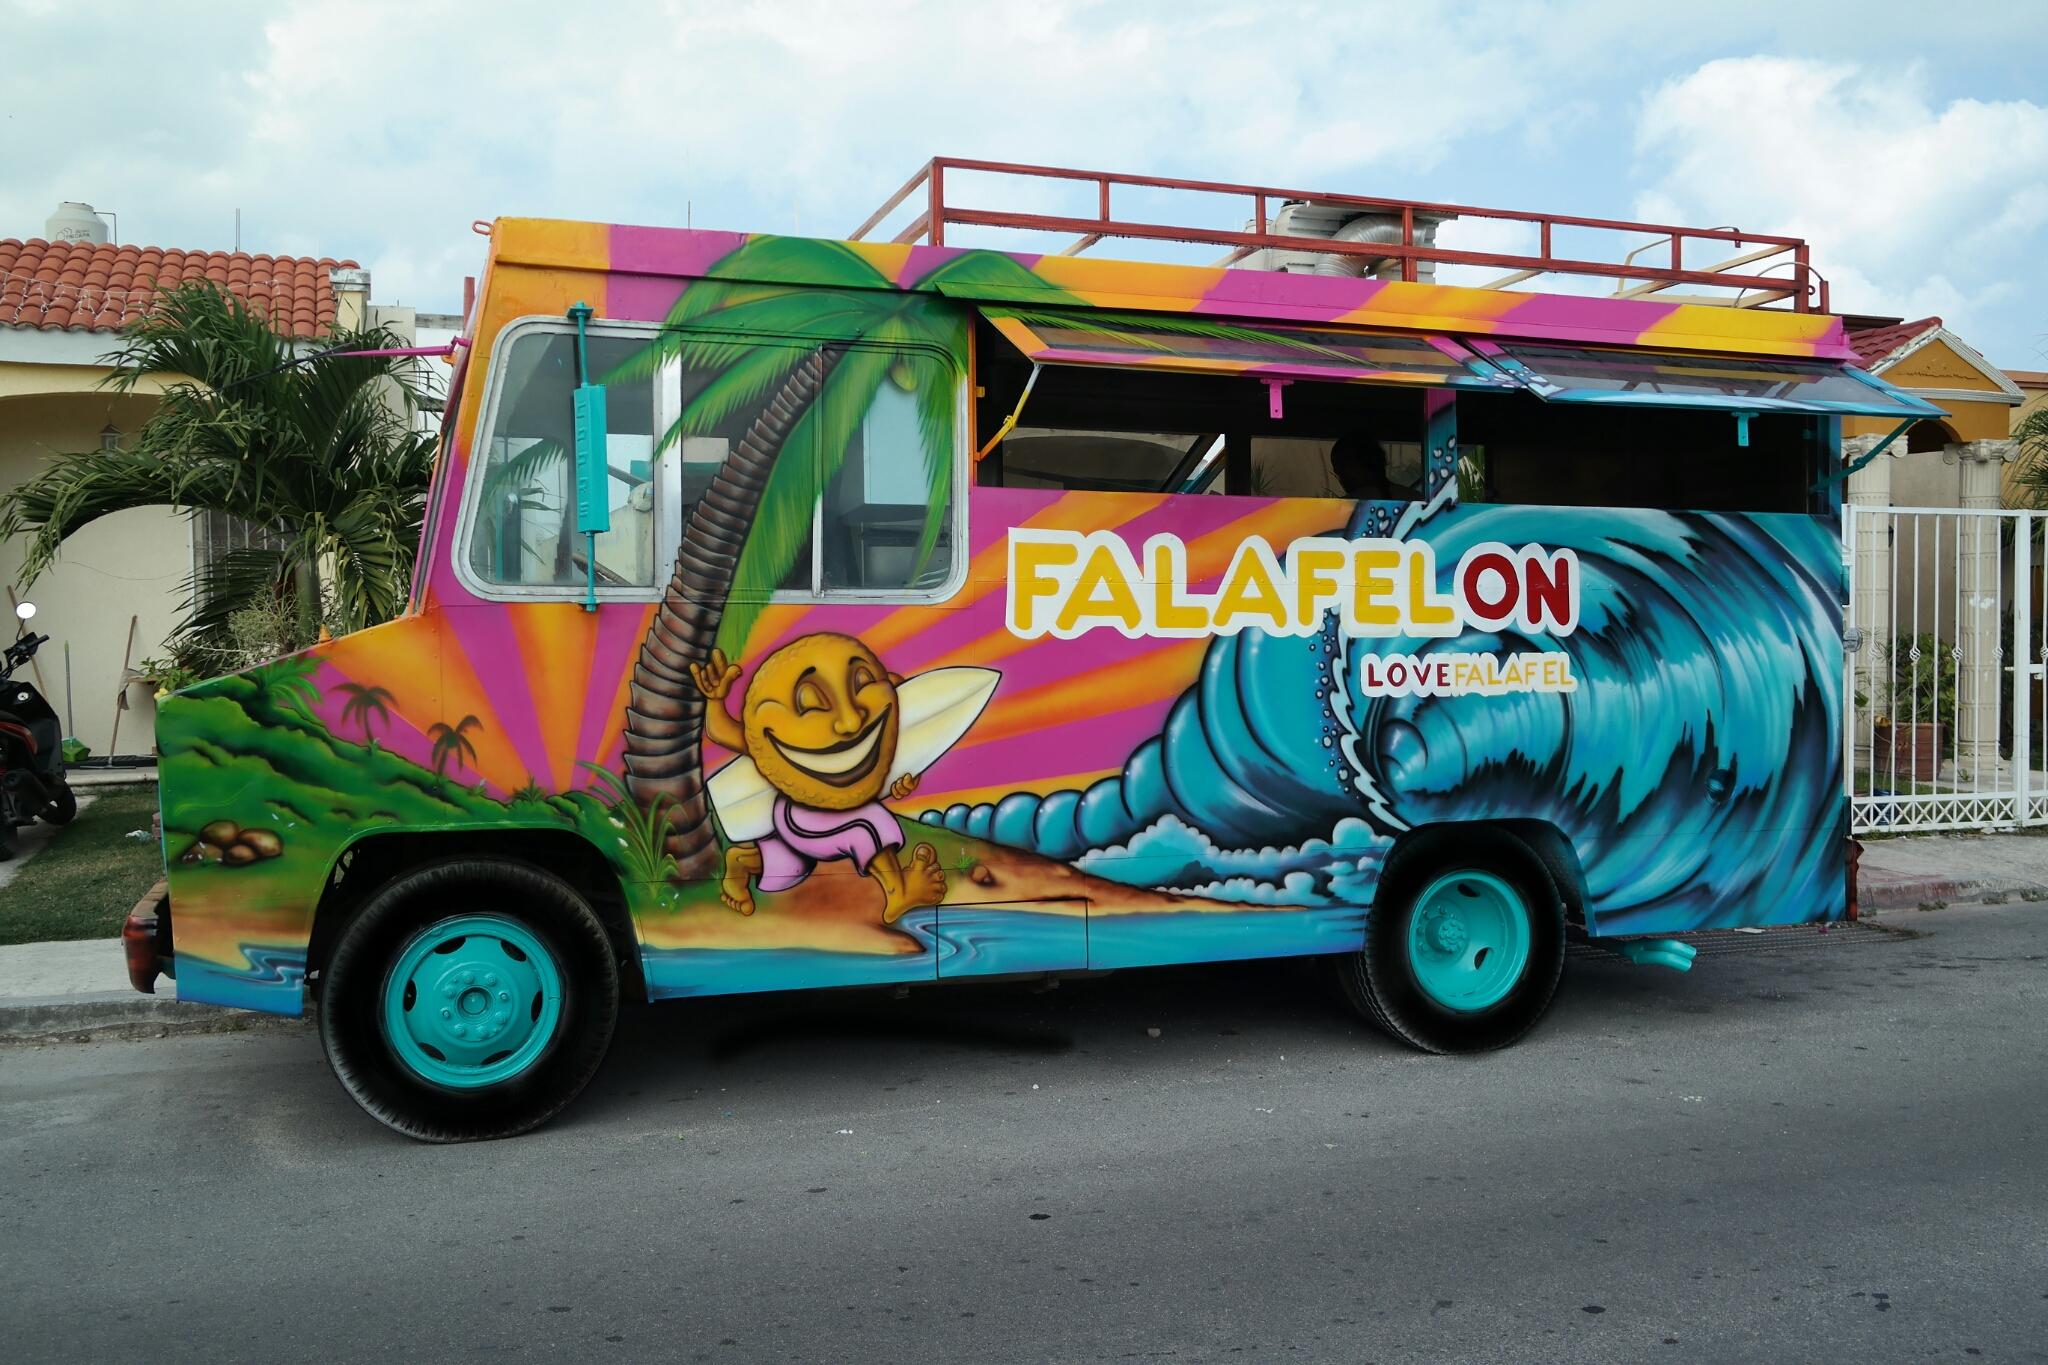 Falafelon Food Truck